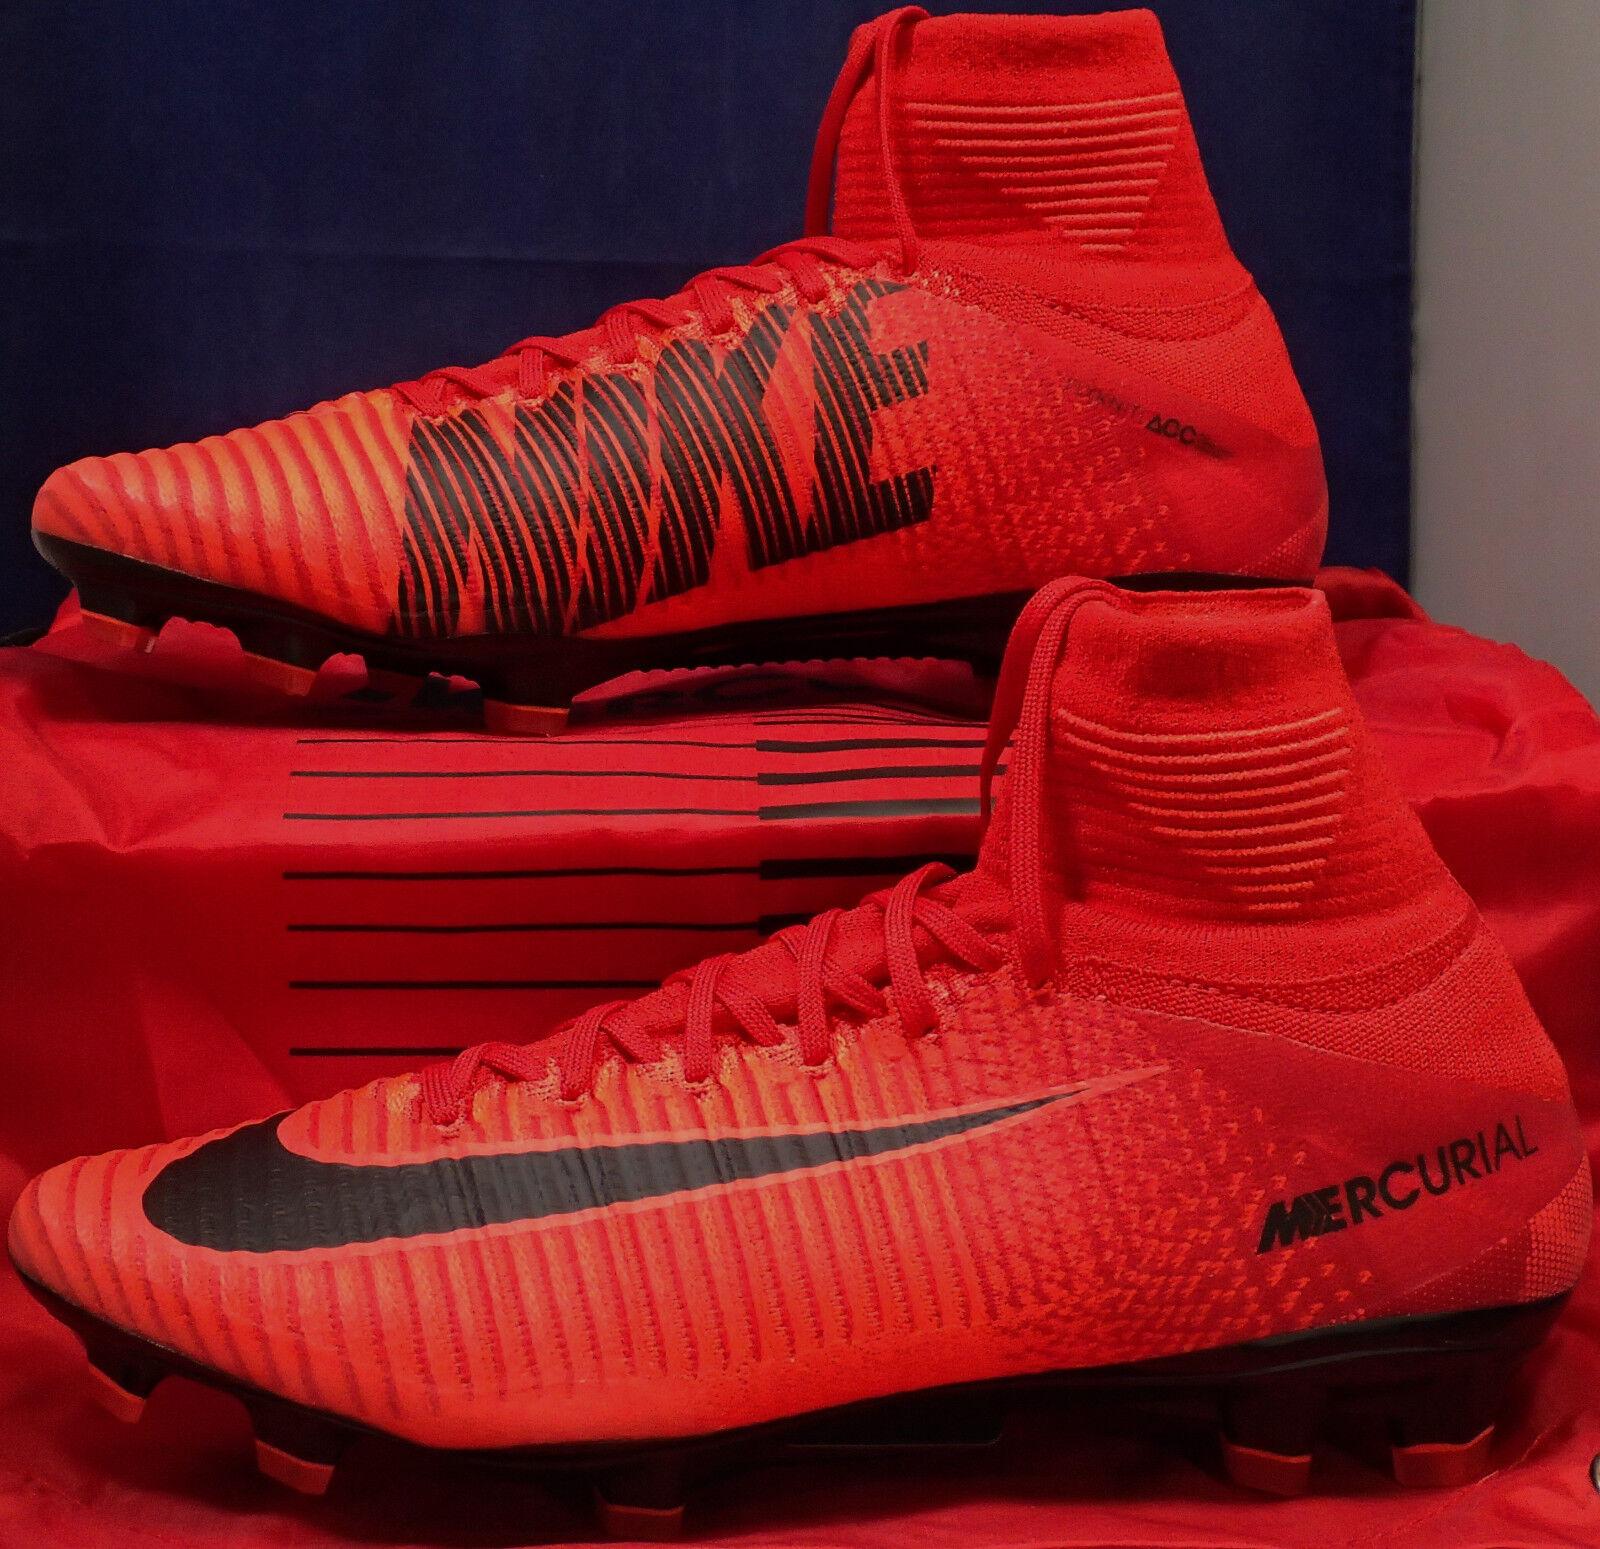 Nike Mercurial Superfly V 5 DF FG University Red Black SZ US 9.5 ( 831940-616 )